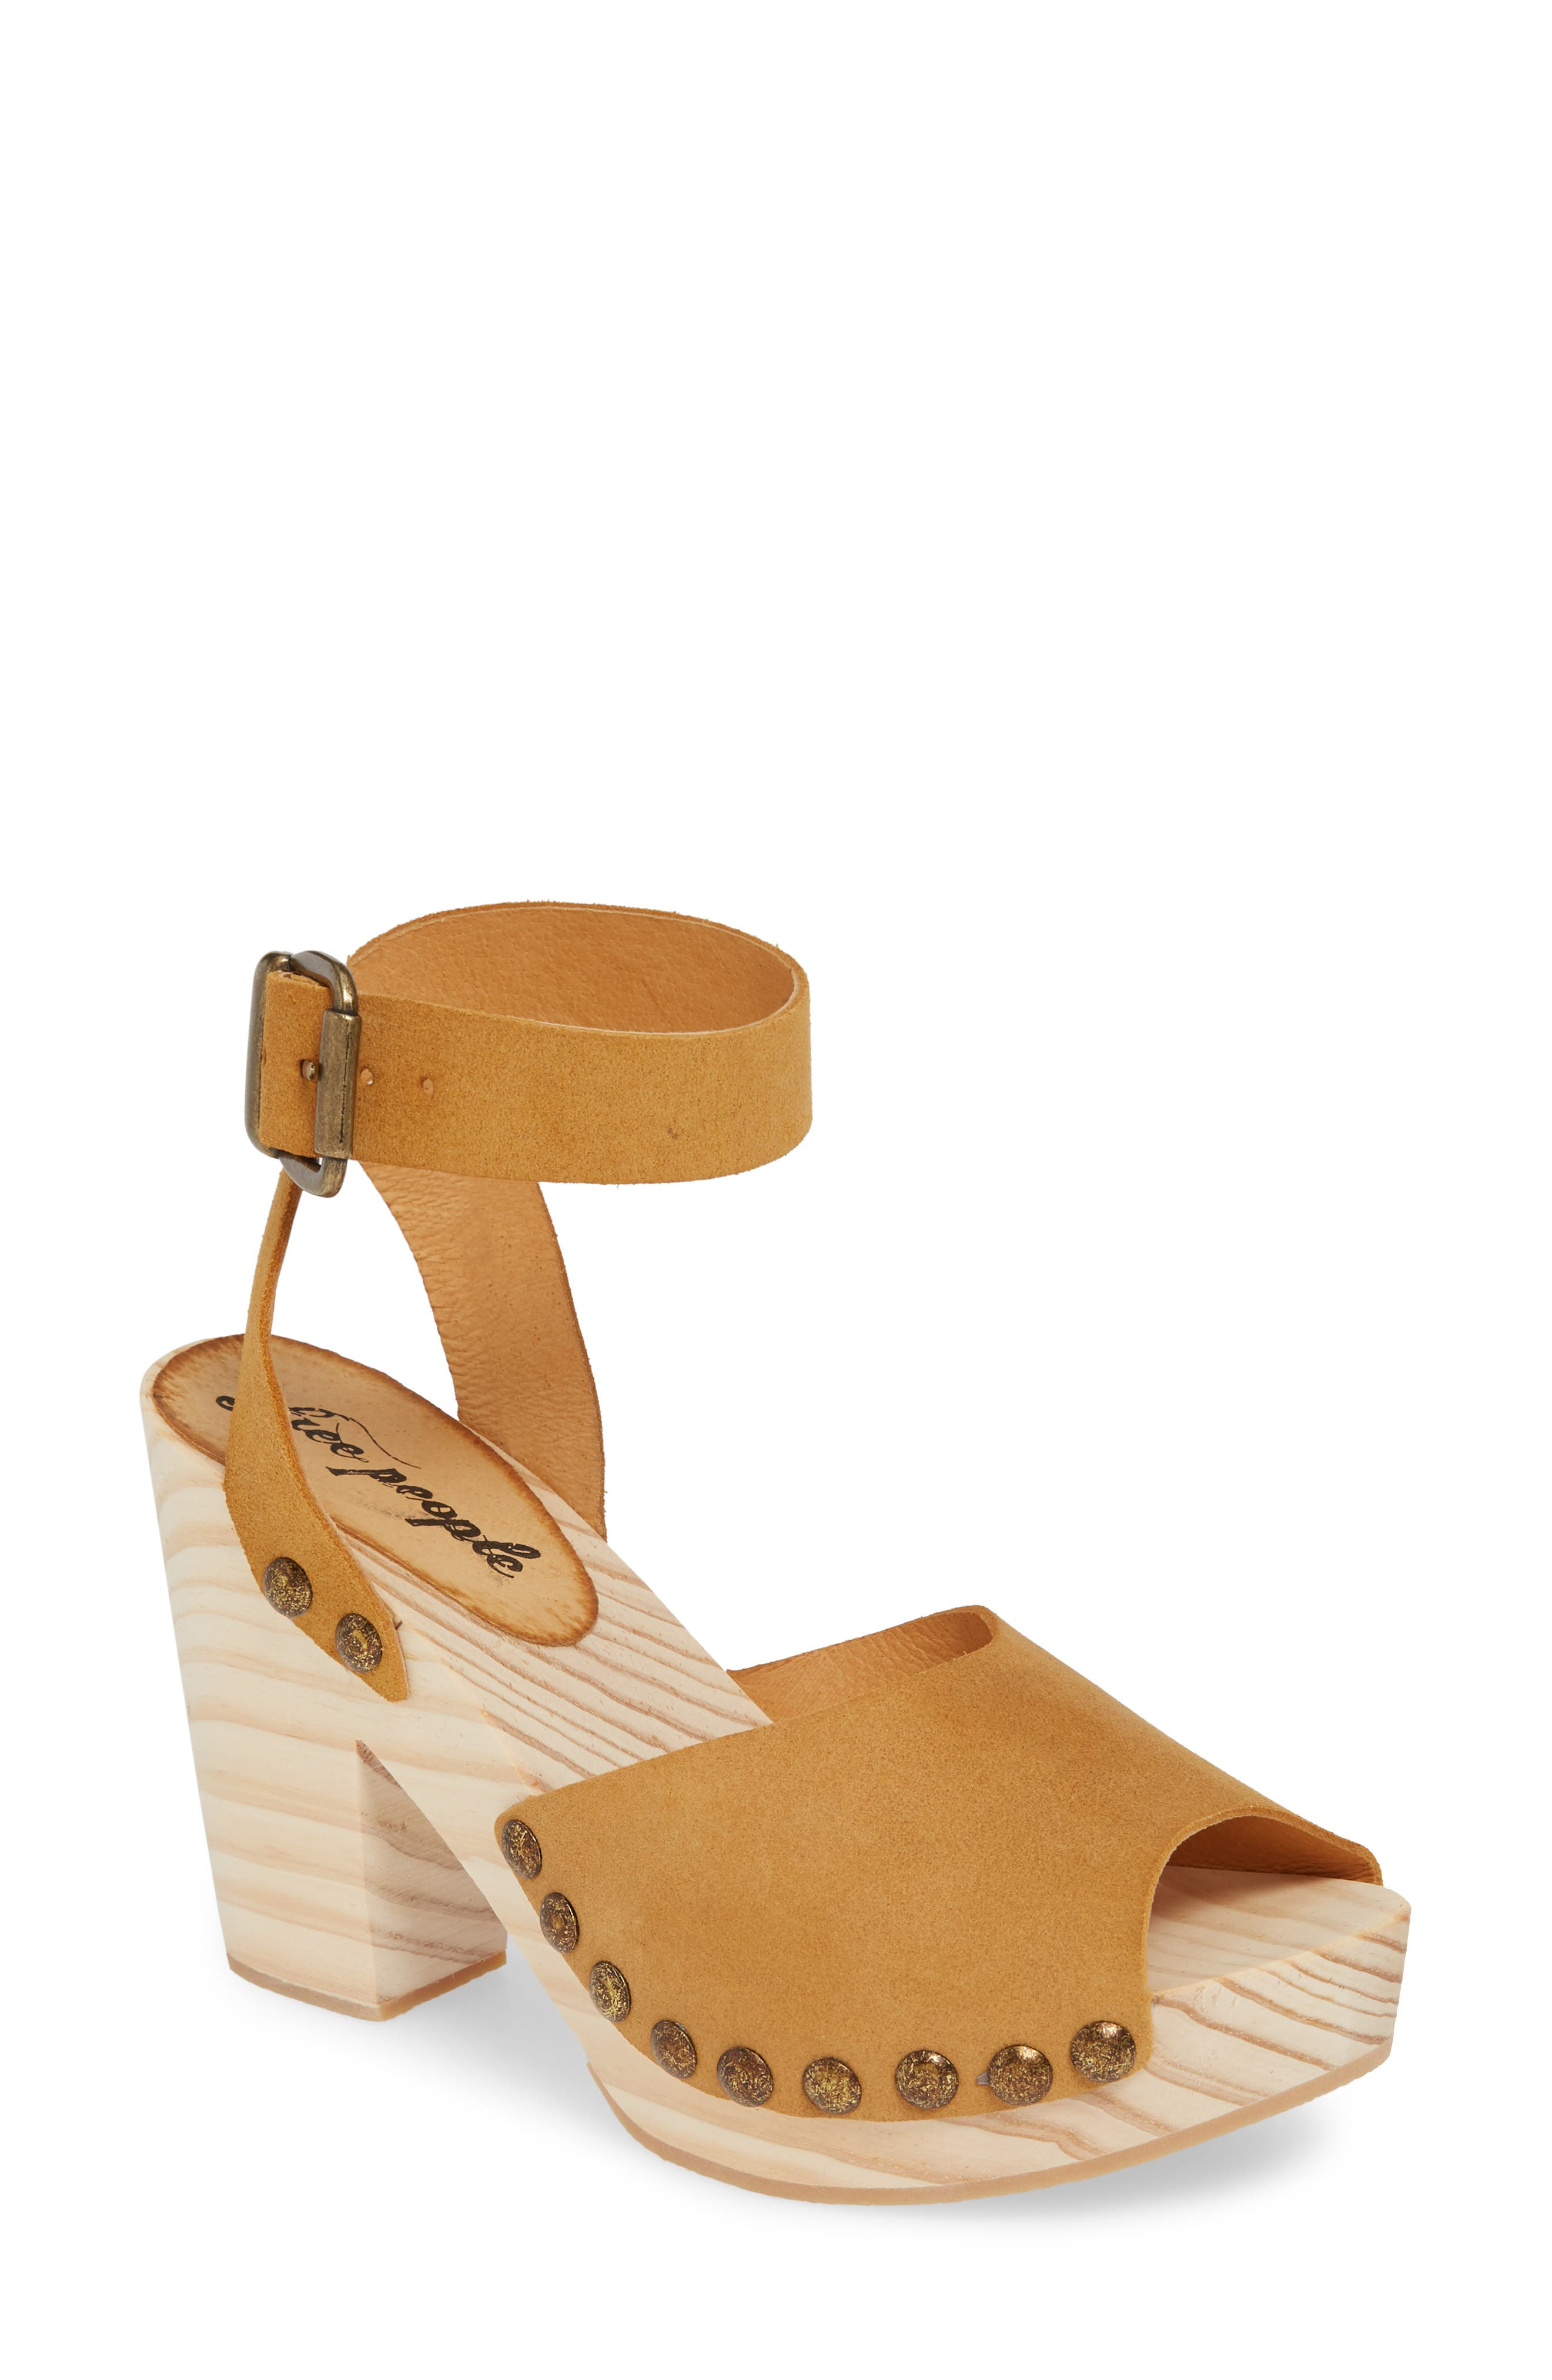 Free People Sandals PASADENA CLOG SANDAL